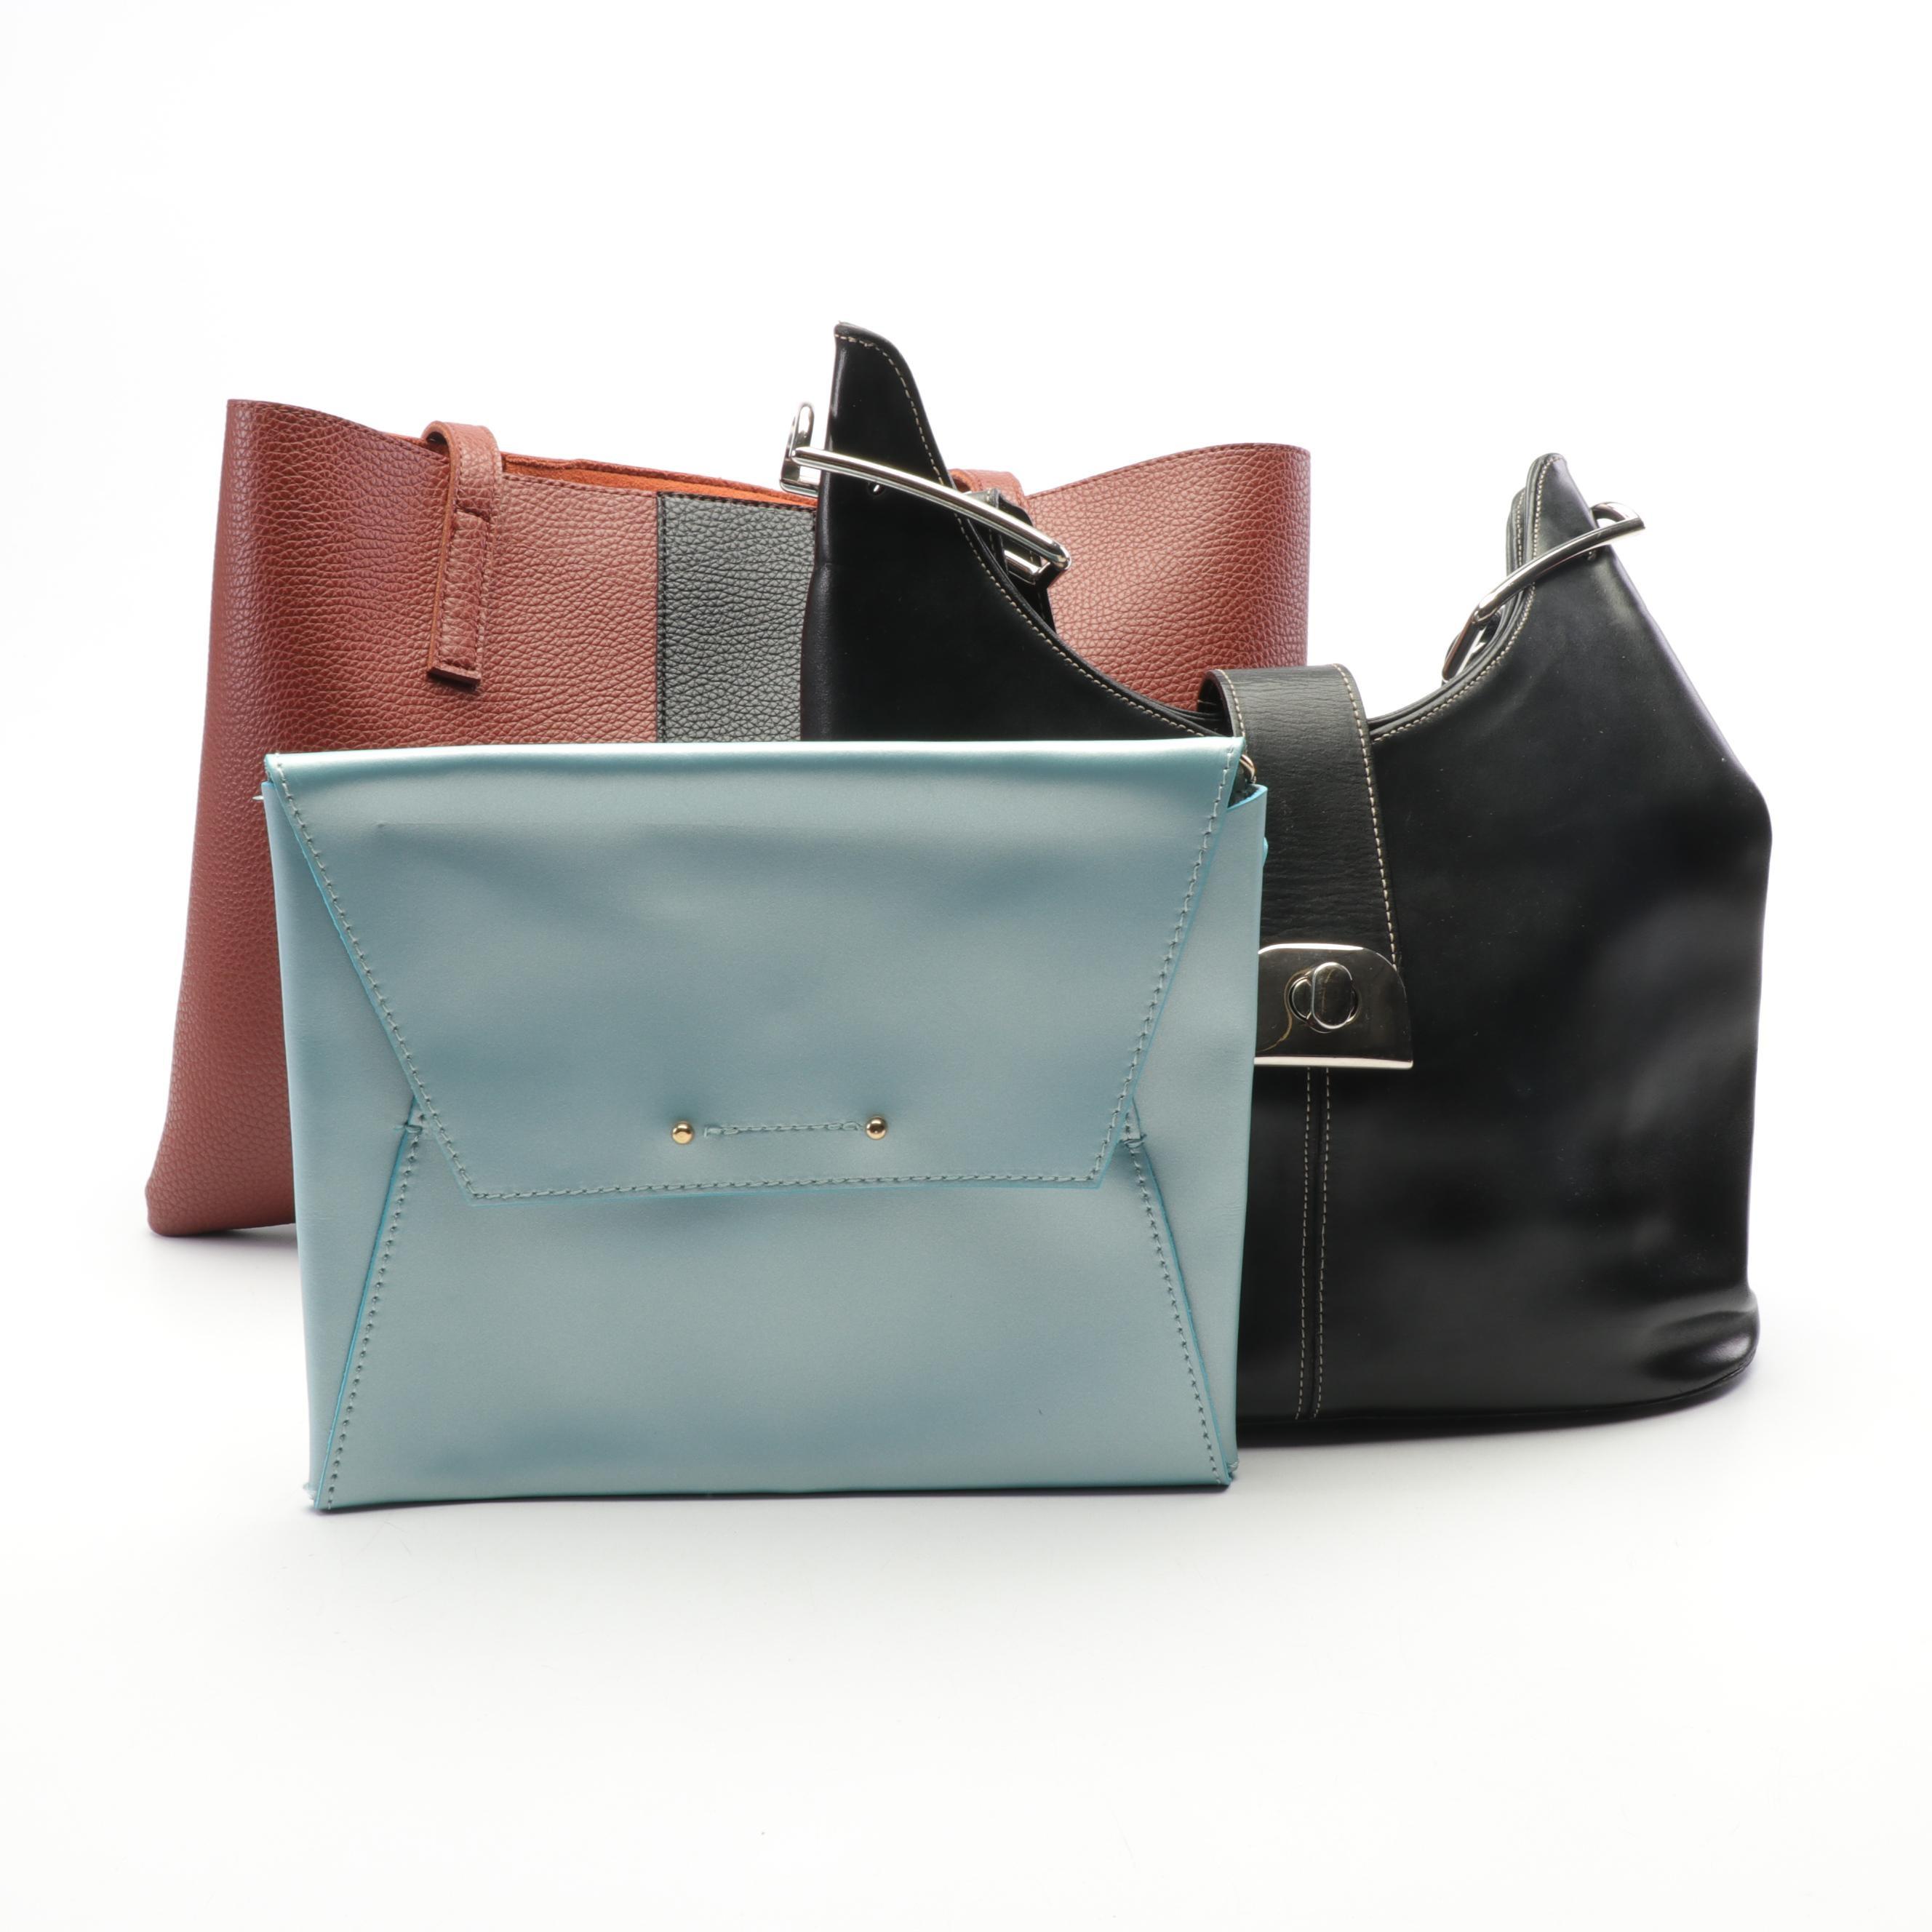 Vince Camuto, Delphine, and Garuglieri Leather Shoulder Bags